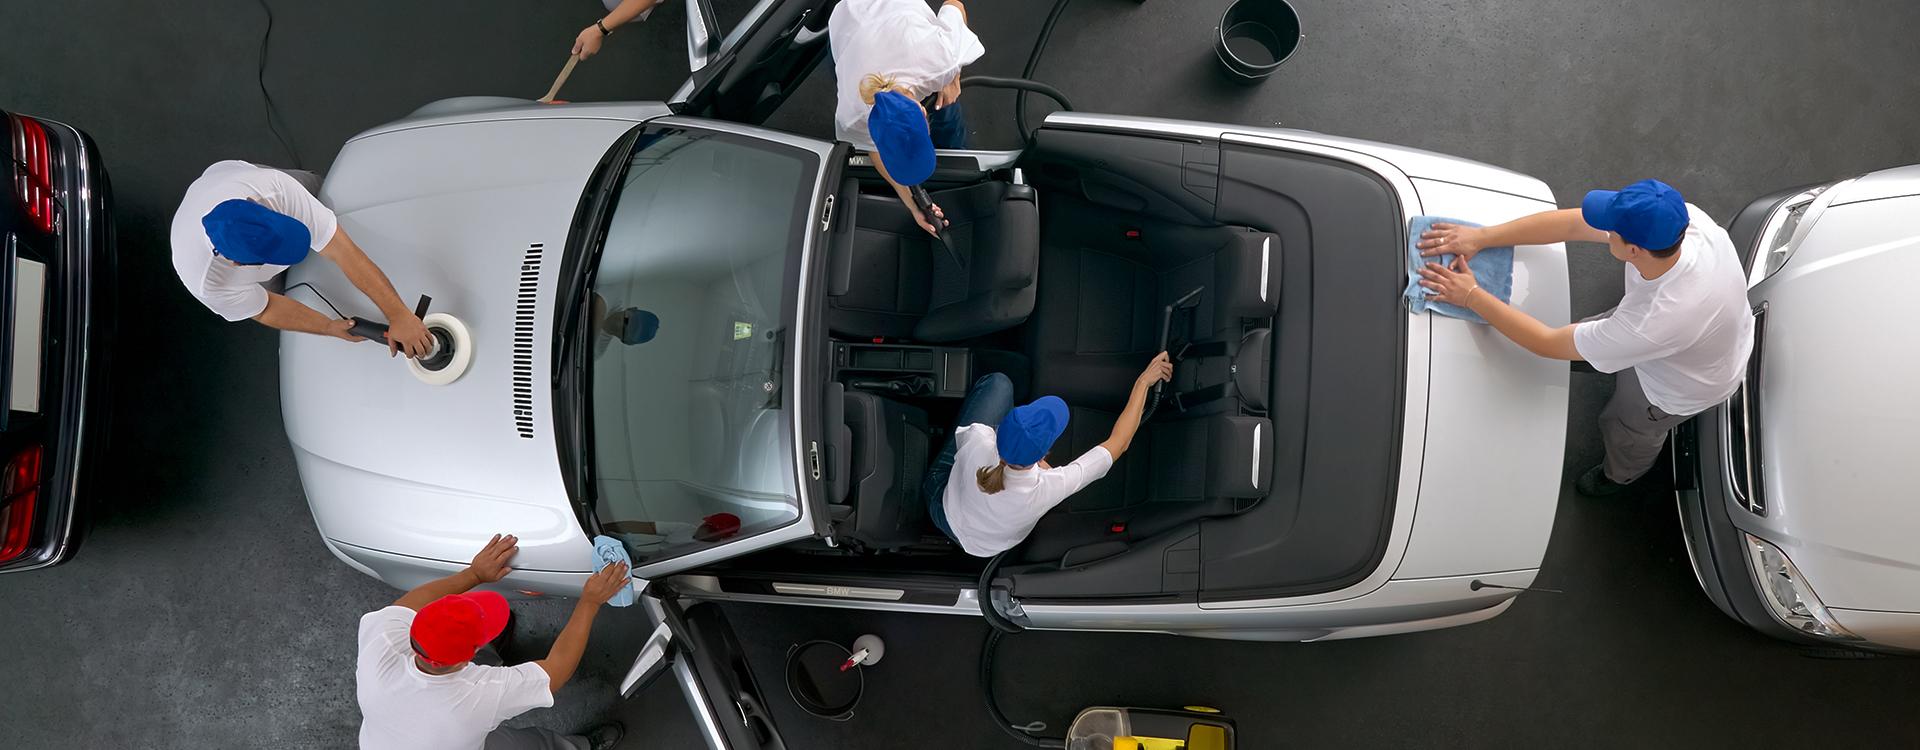 igienizare auto